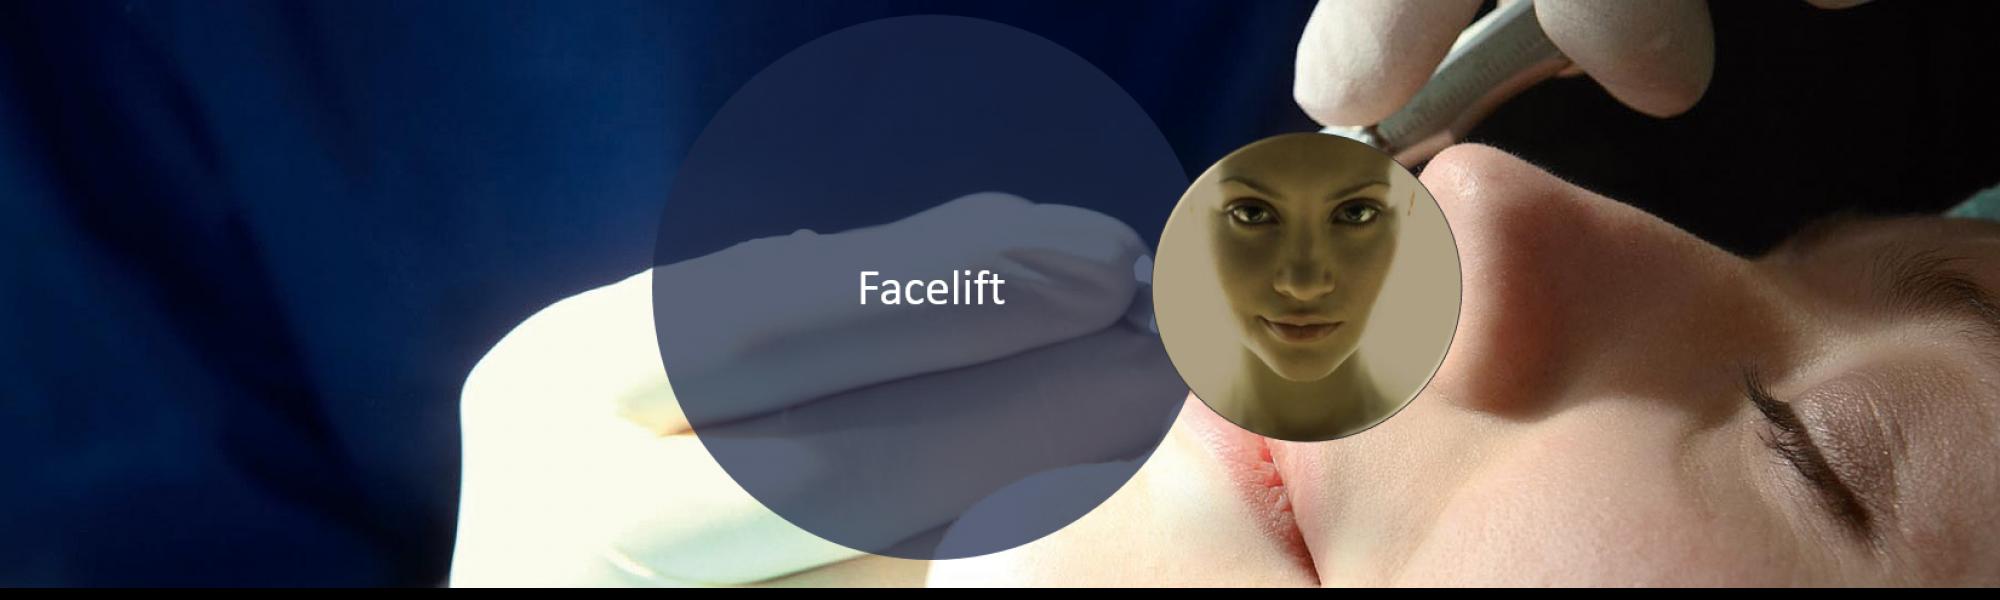 Ästhetische Gesichtschirurgie Facelift bei Groisman Laube